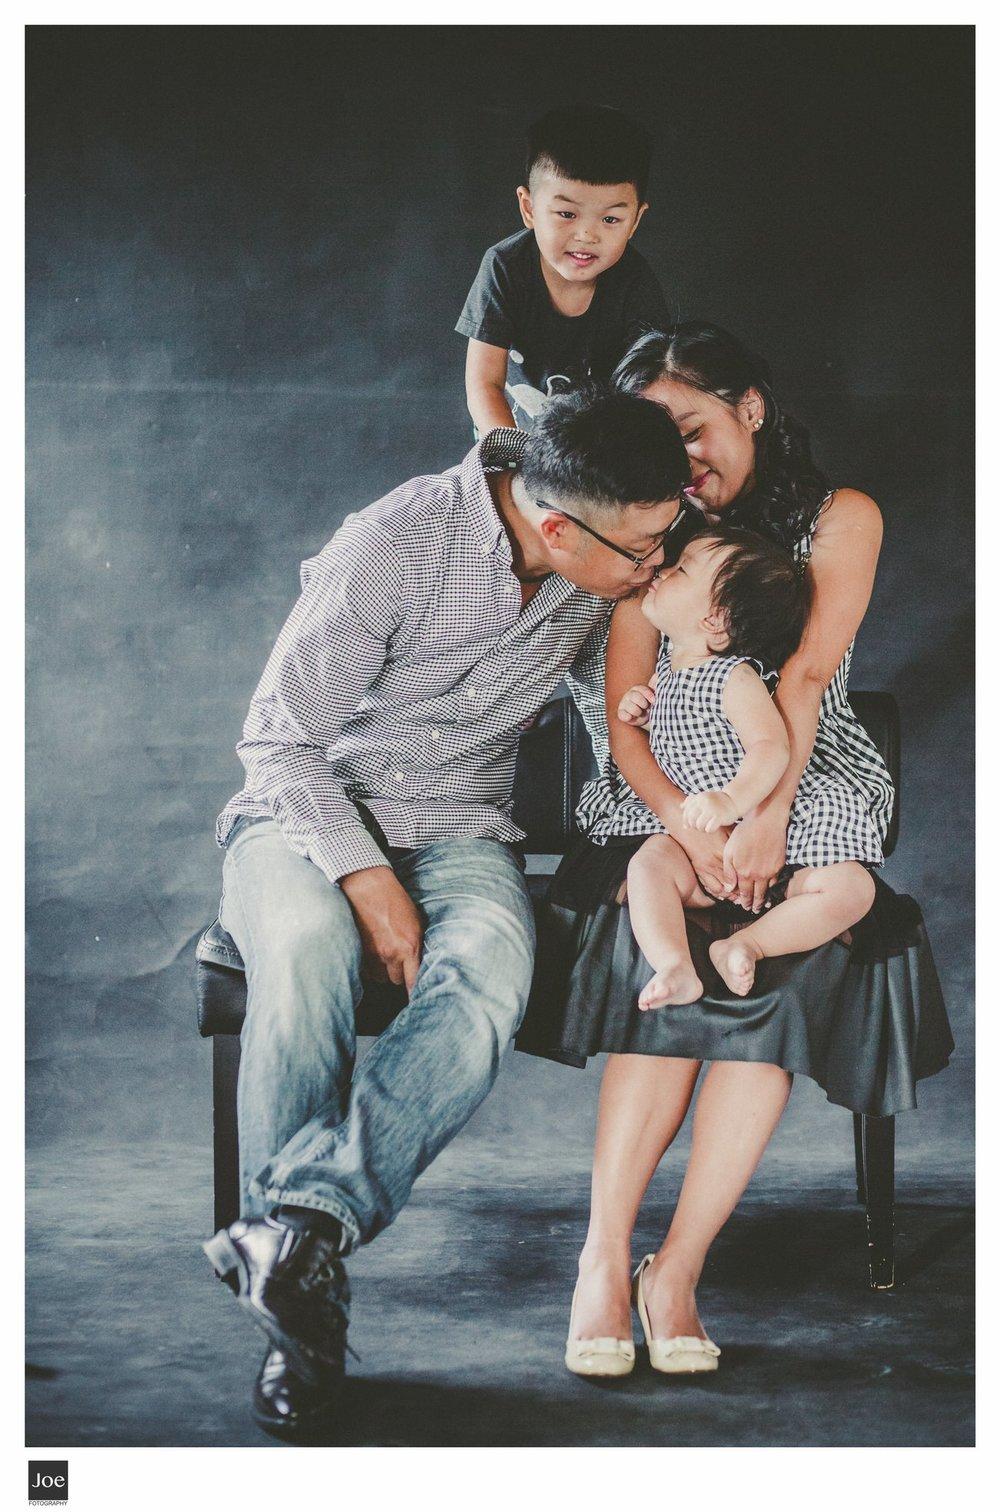 joe-fotography-family-photo-pepper-salt-bowtie-016.jpg